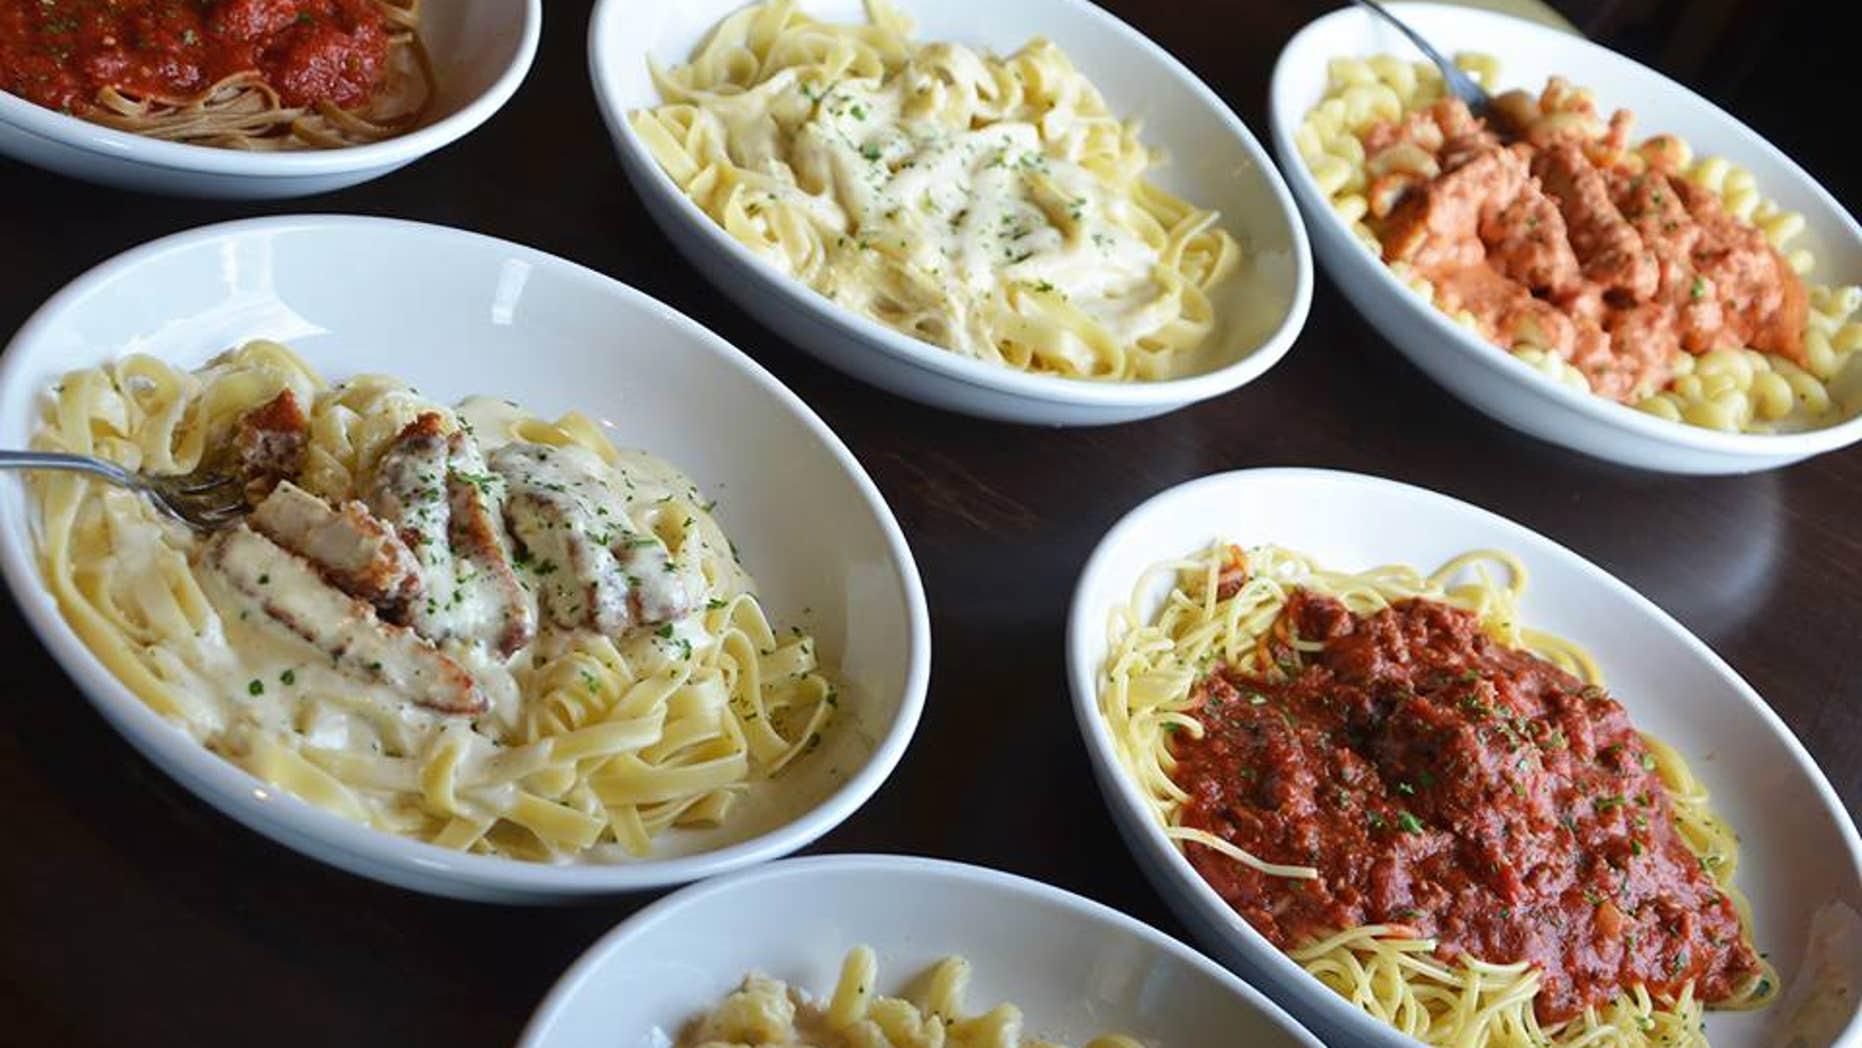 Overloaded pasta menus may be hurting Italian chain sales.